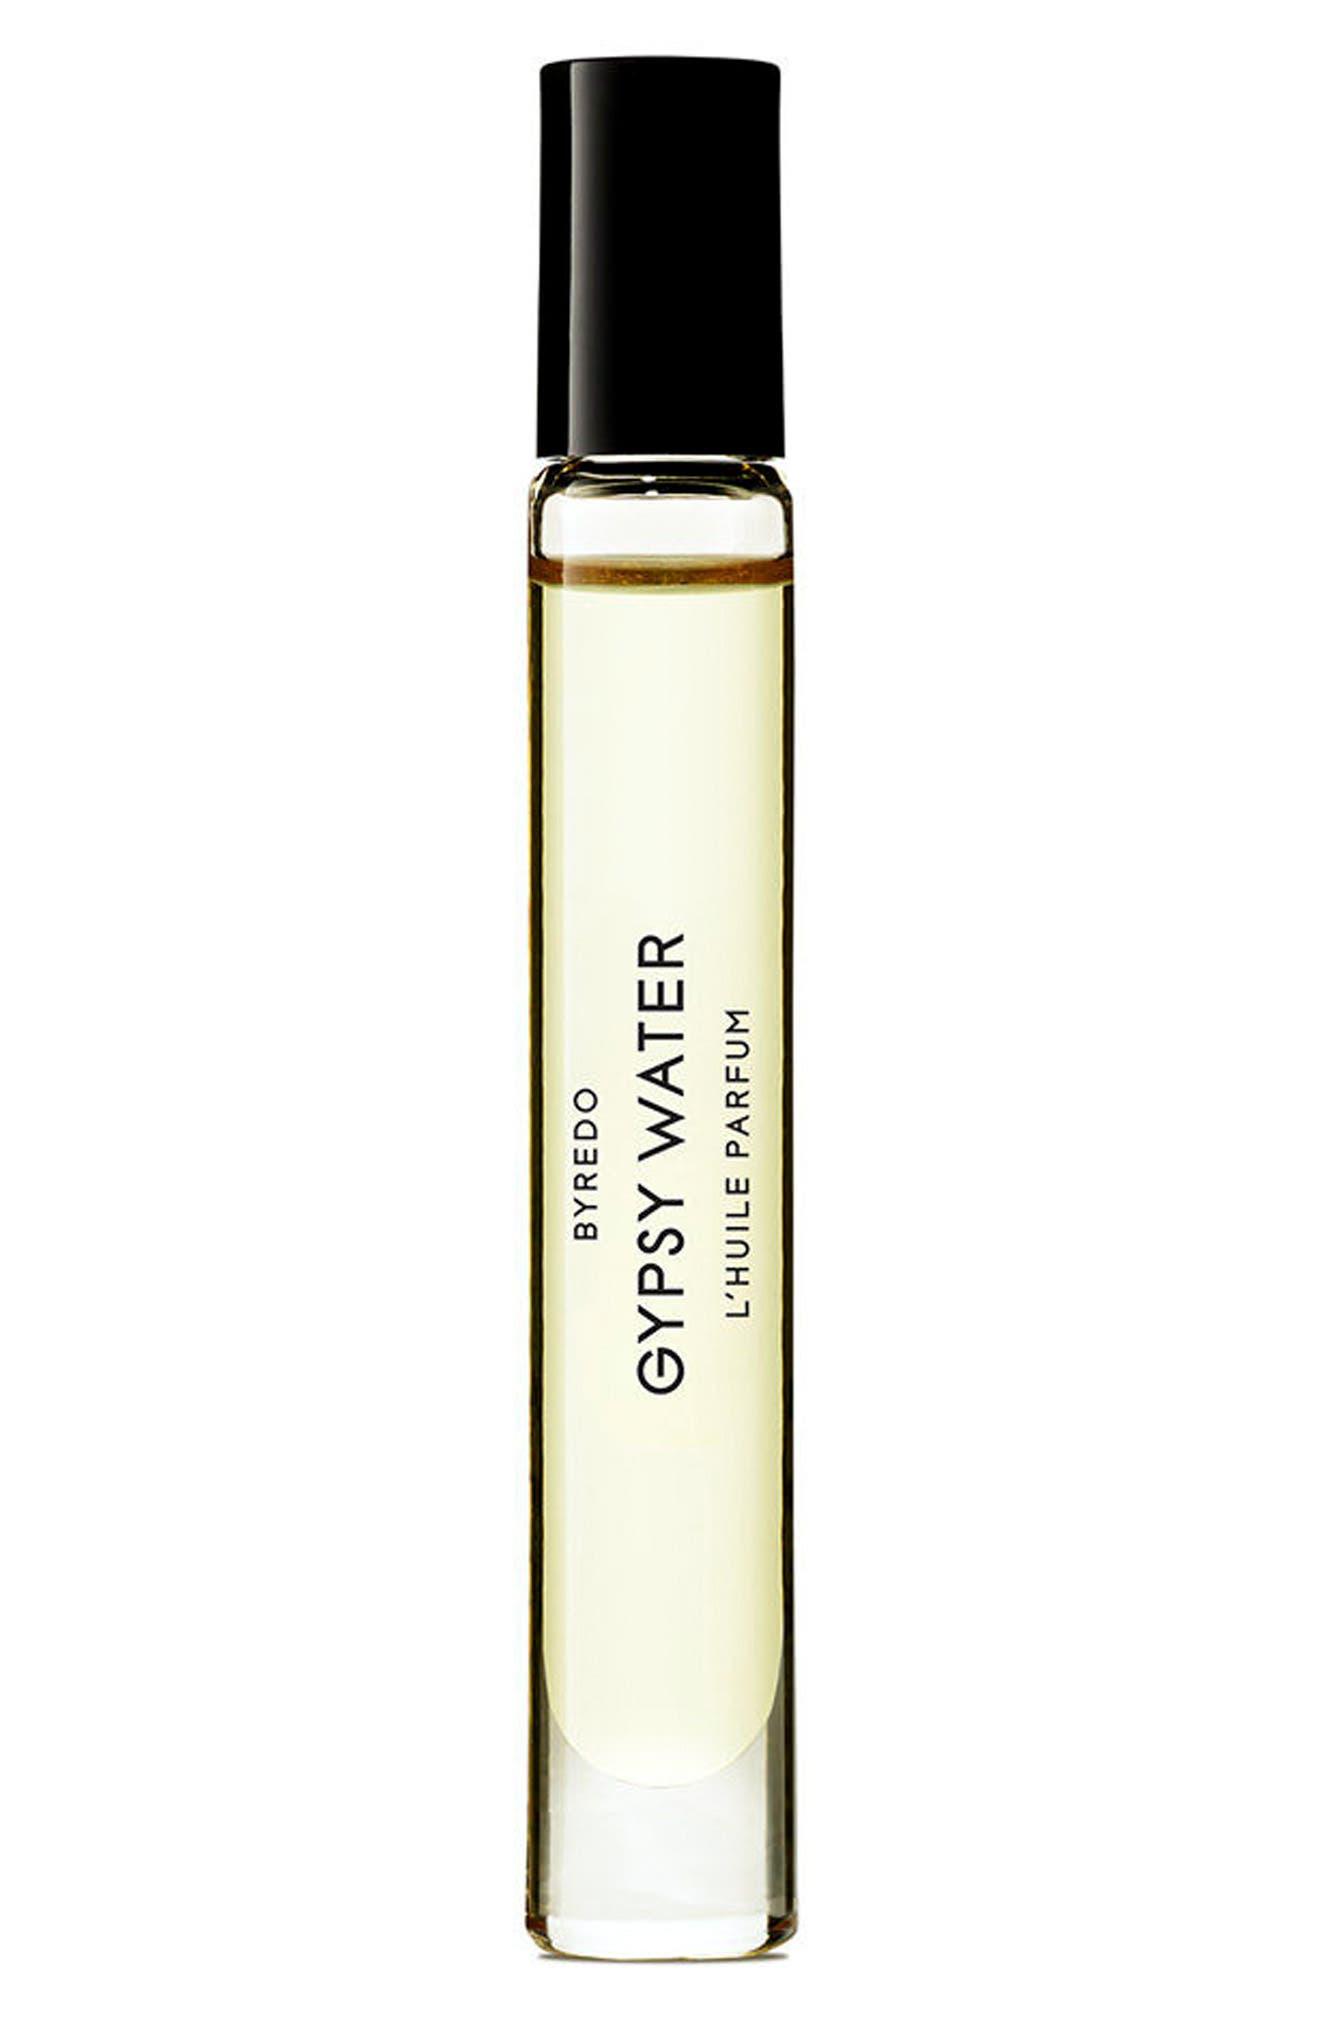 Gypsy Water Eau de Parfum Rollerball,                             Main thumbnail 1, color,                             000